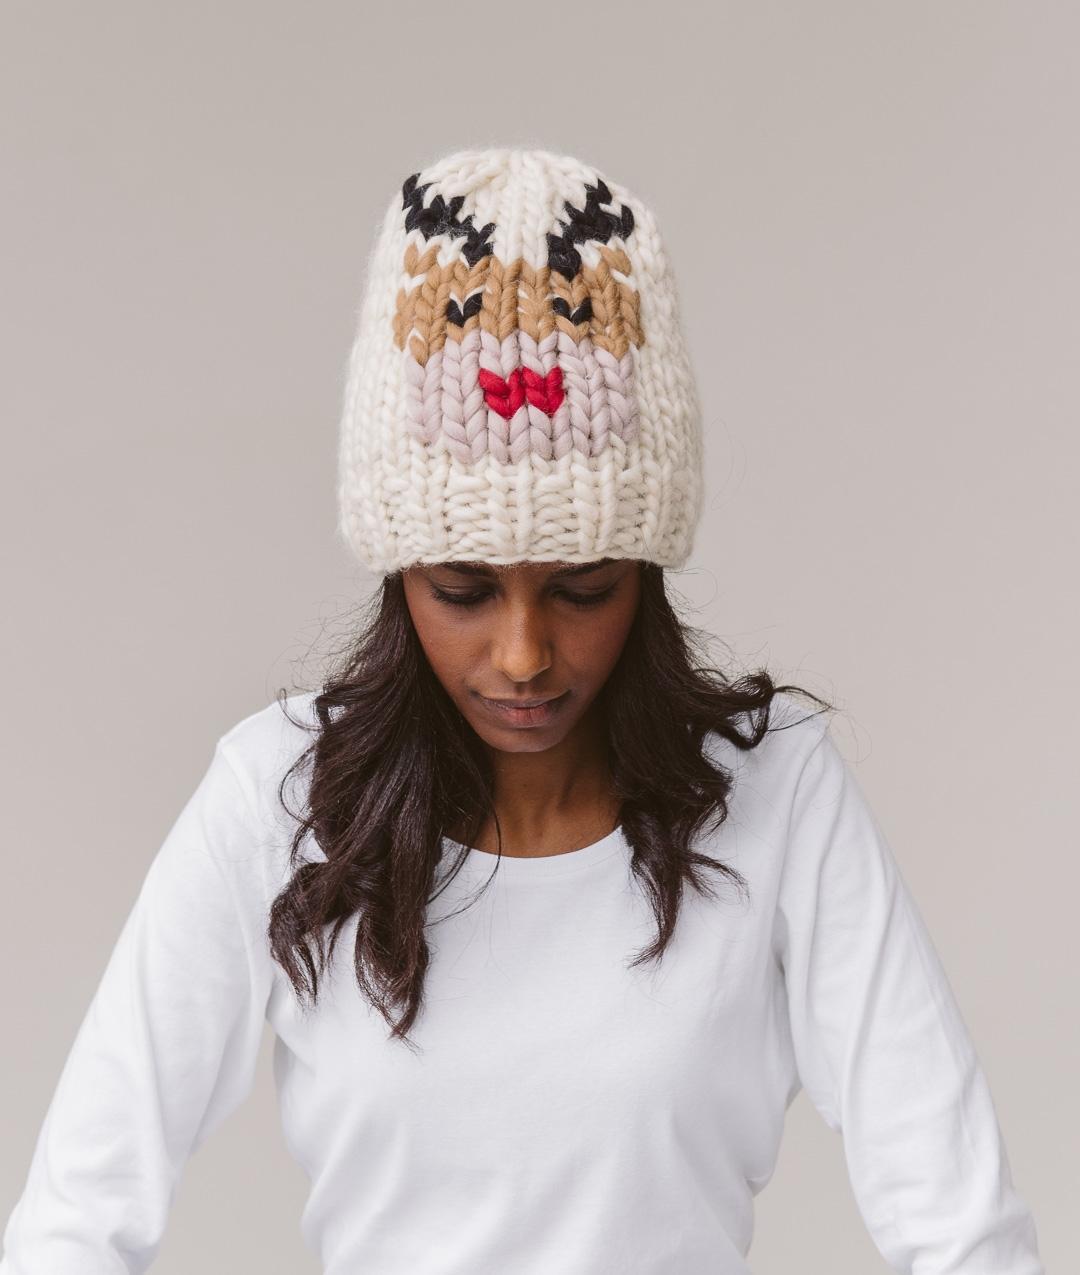 Ready Made - XMAS BEANIE - Reindeer - Handmade - 1